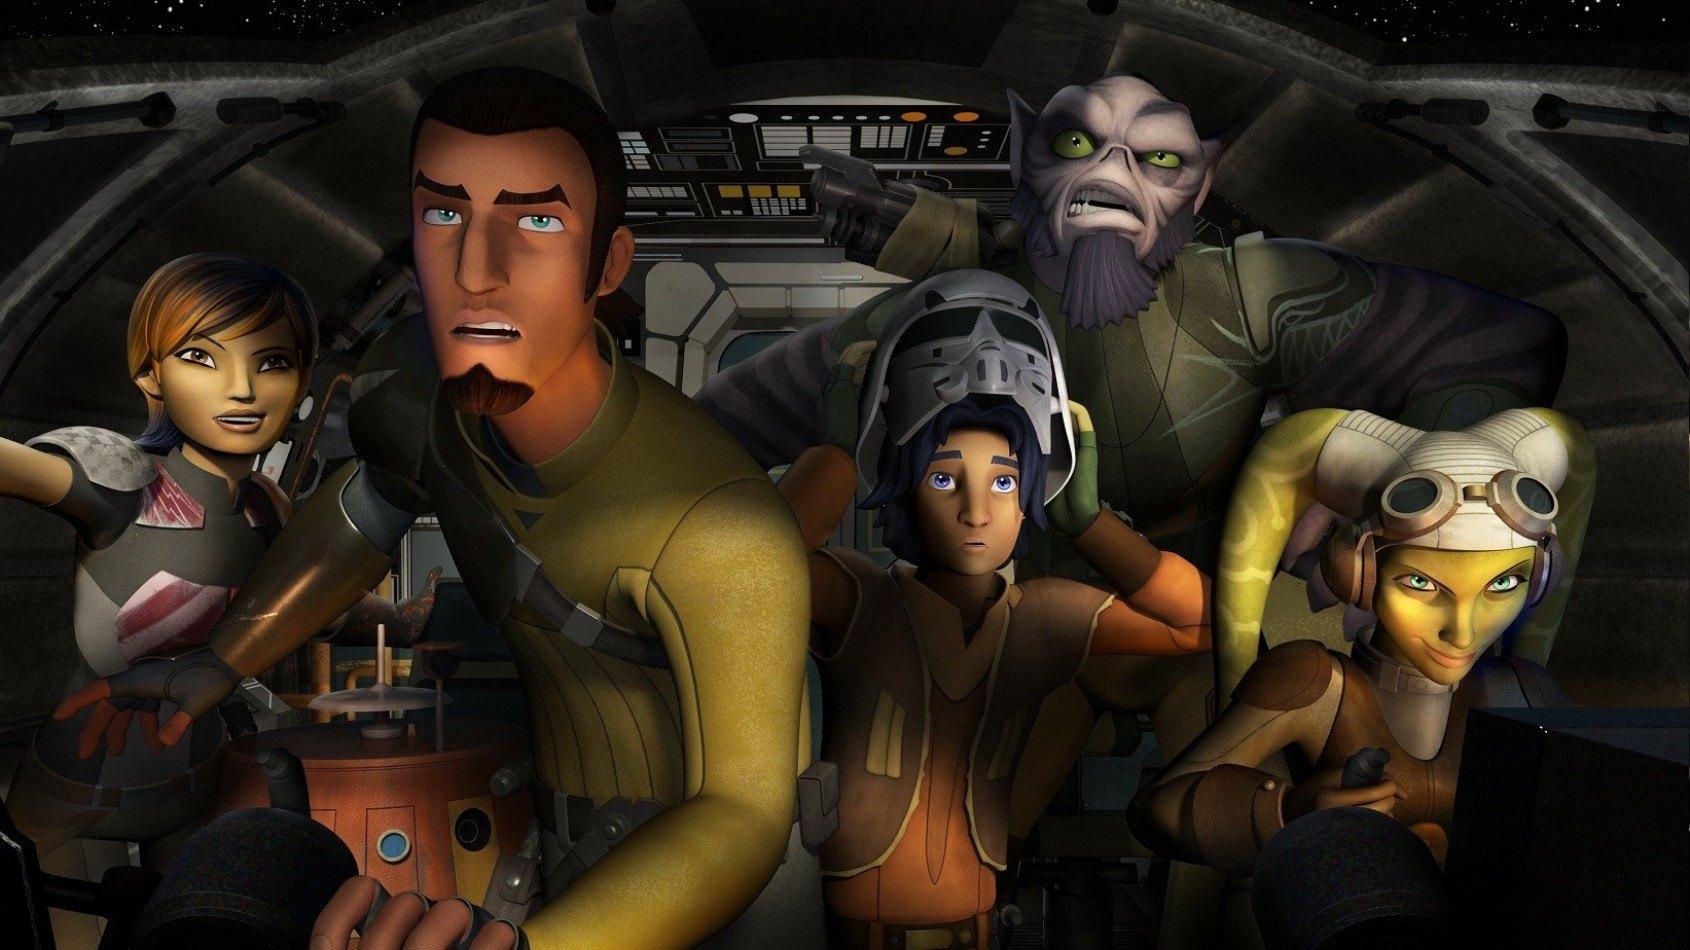 Un concept de McQuarrie dans Star Wars Rebels?